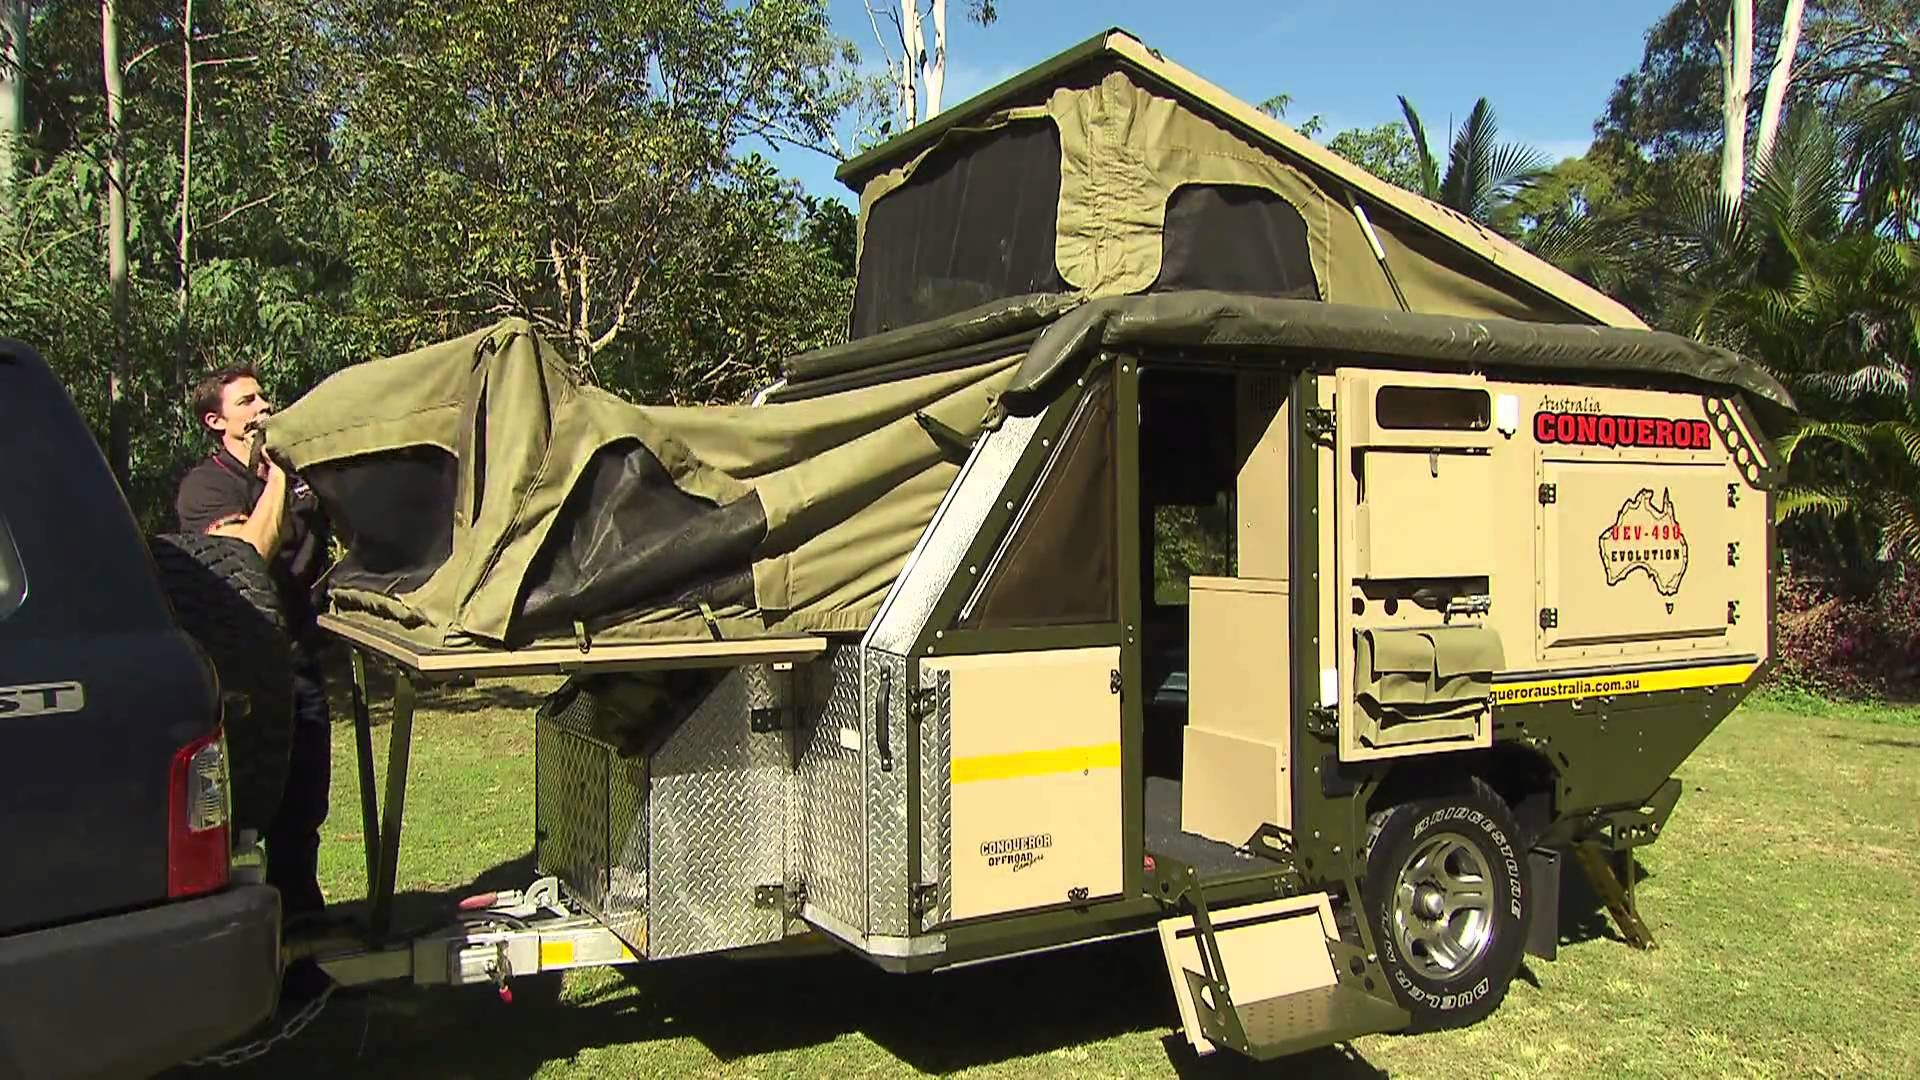 Mk1 UEV 490 off-road camper trailer Conqueror Australia ...